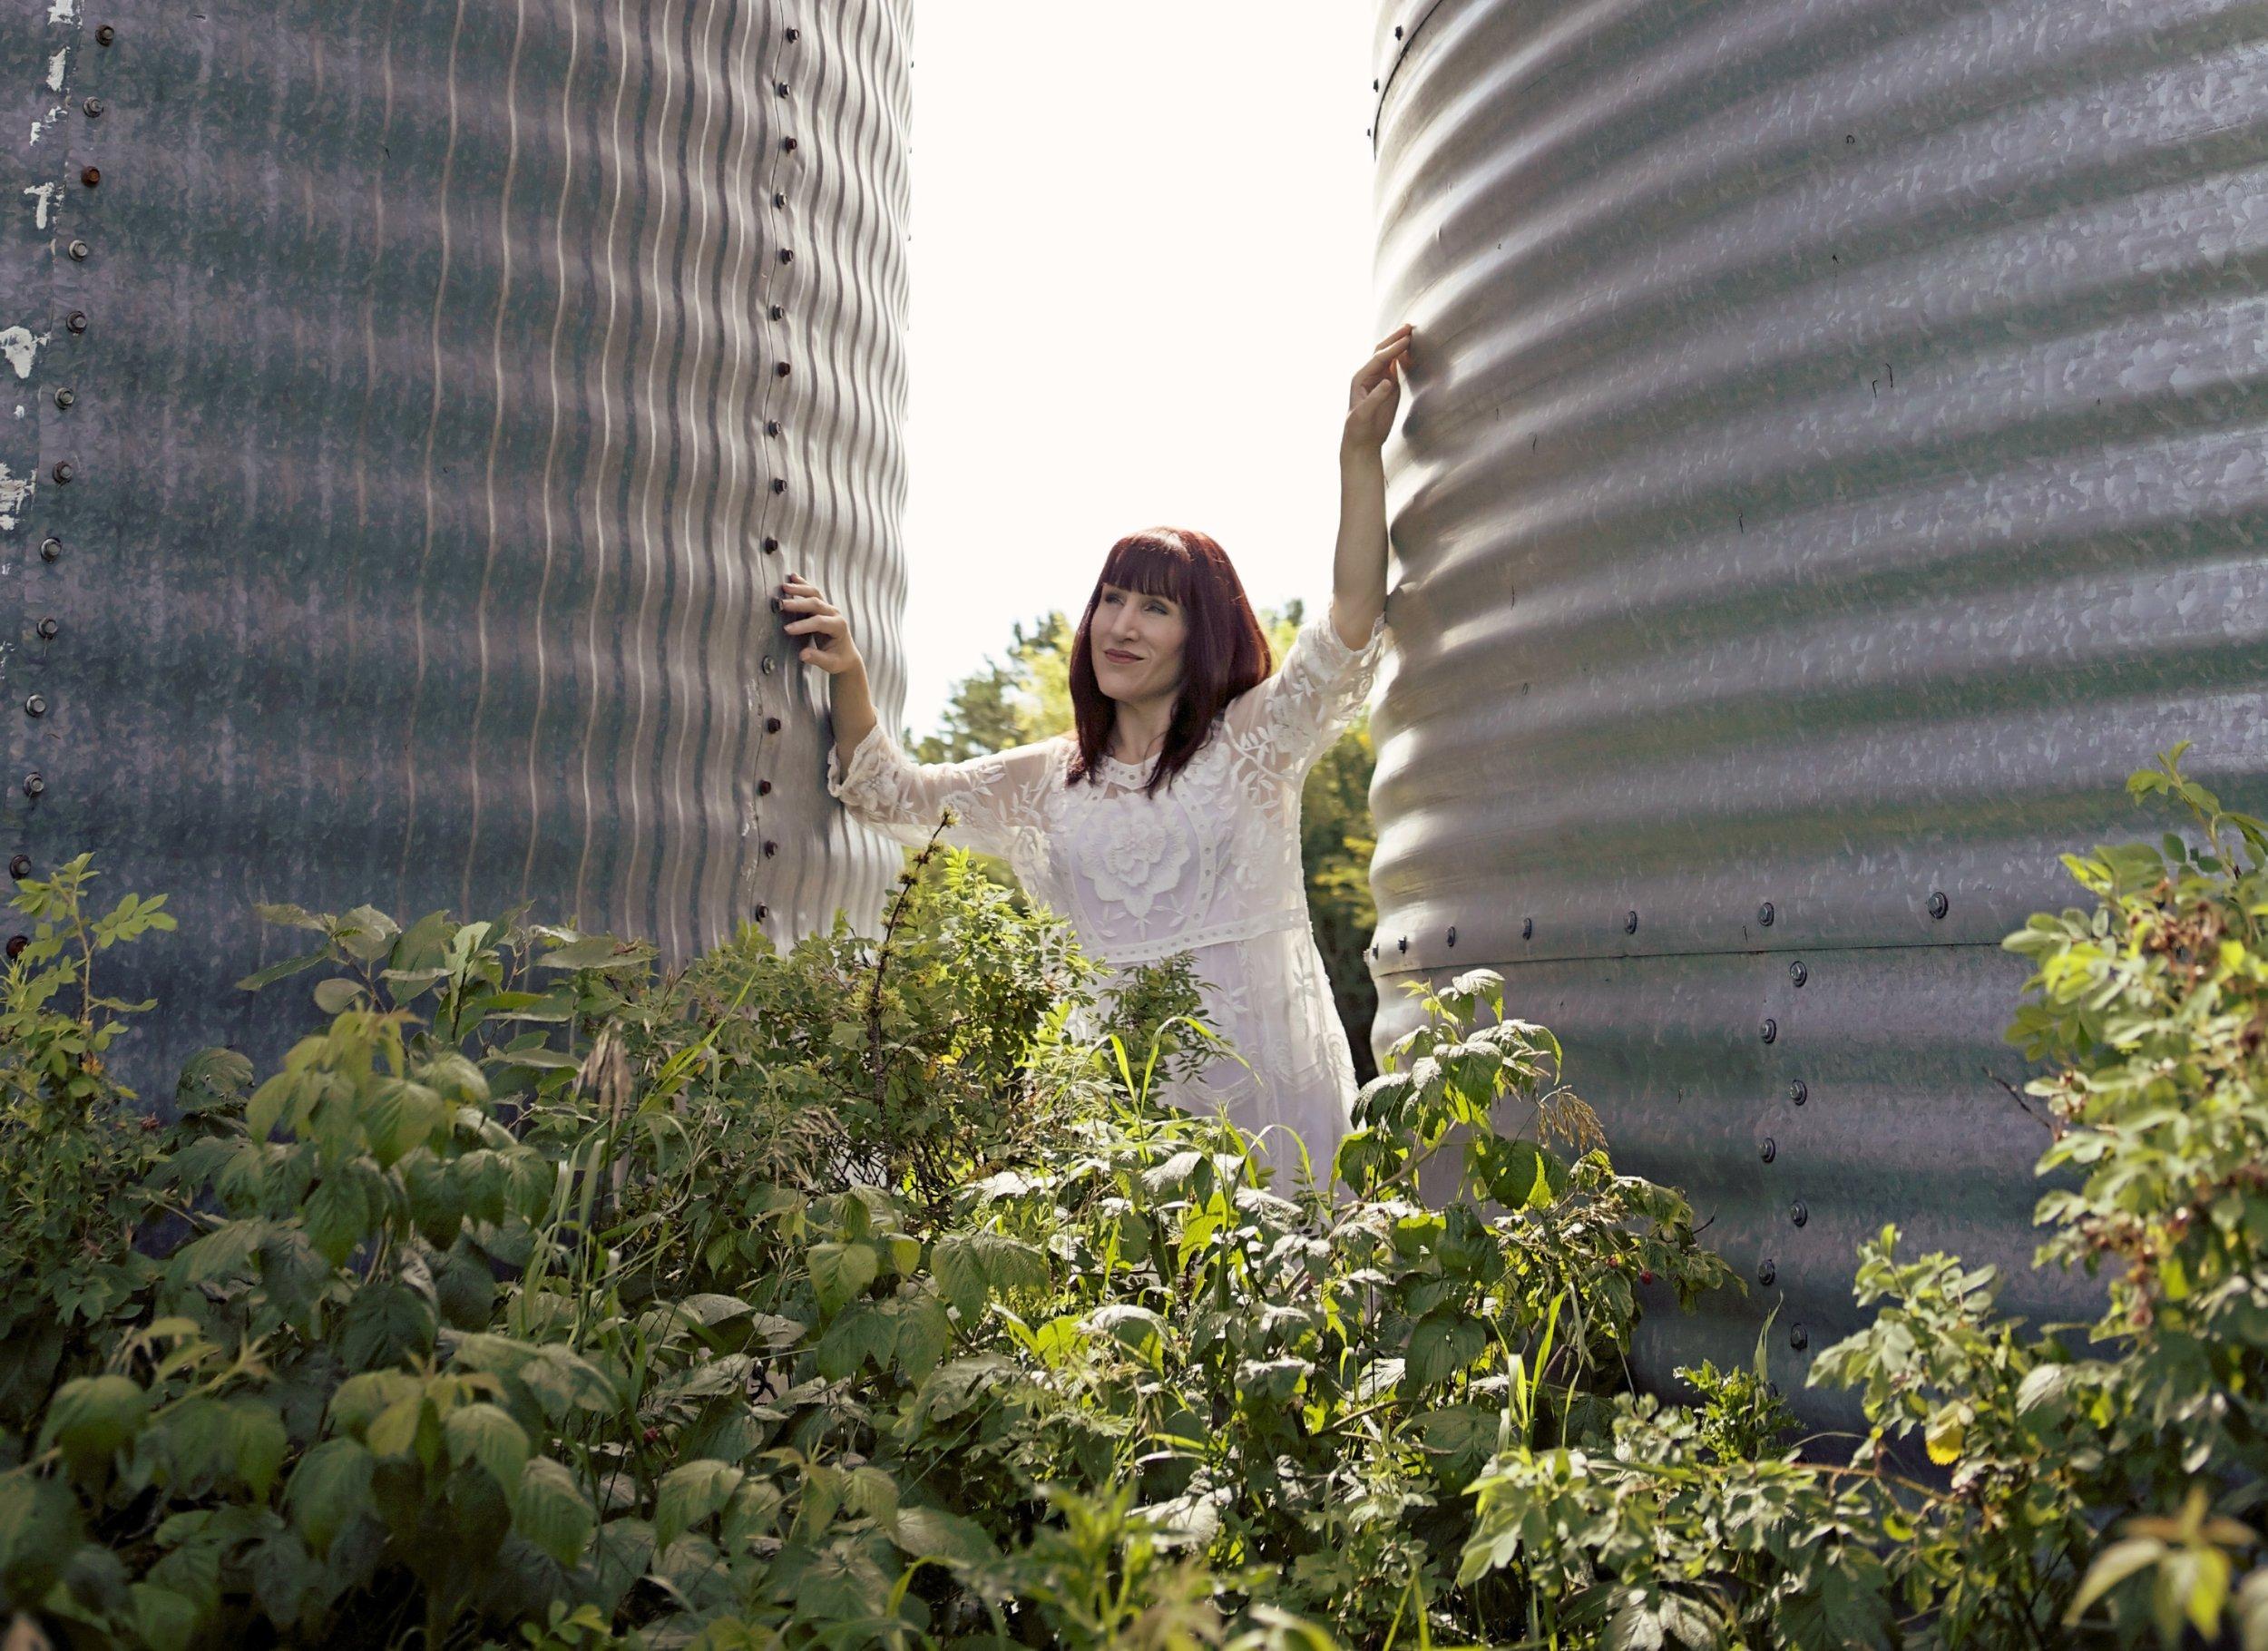 Farm girl 10.jpg